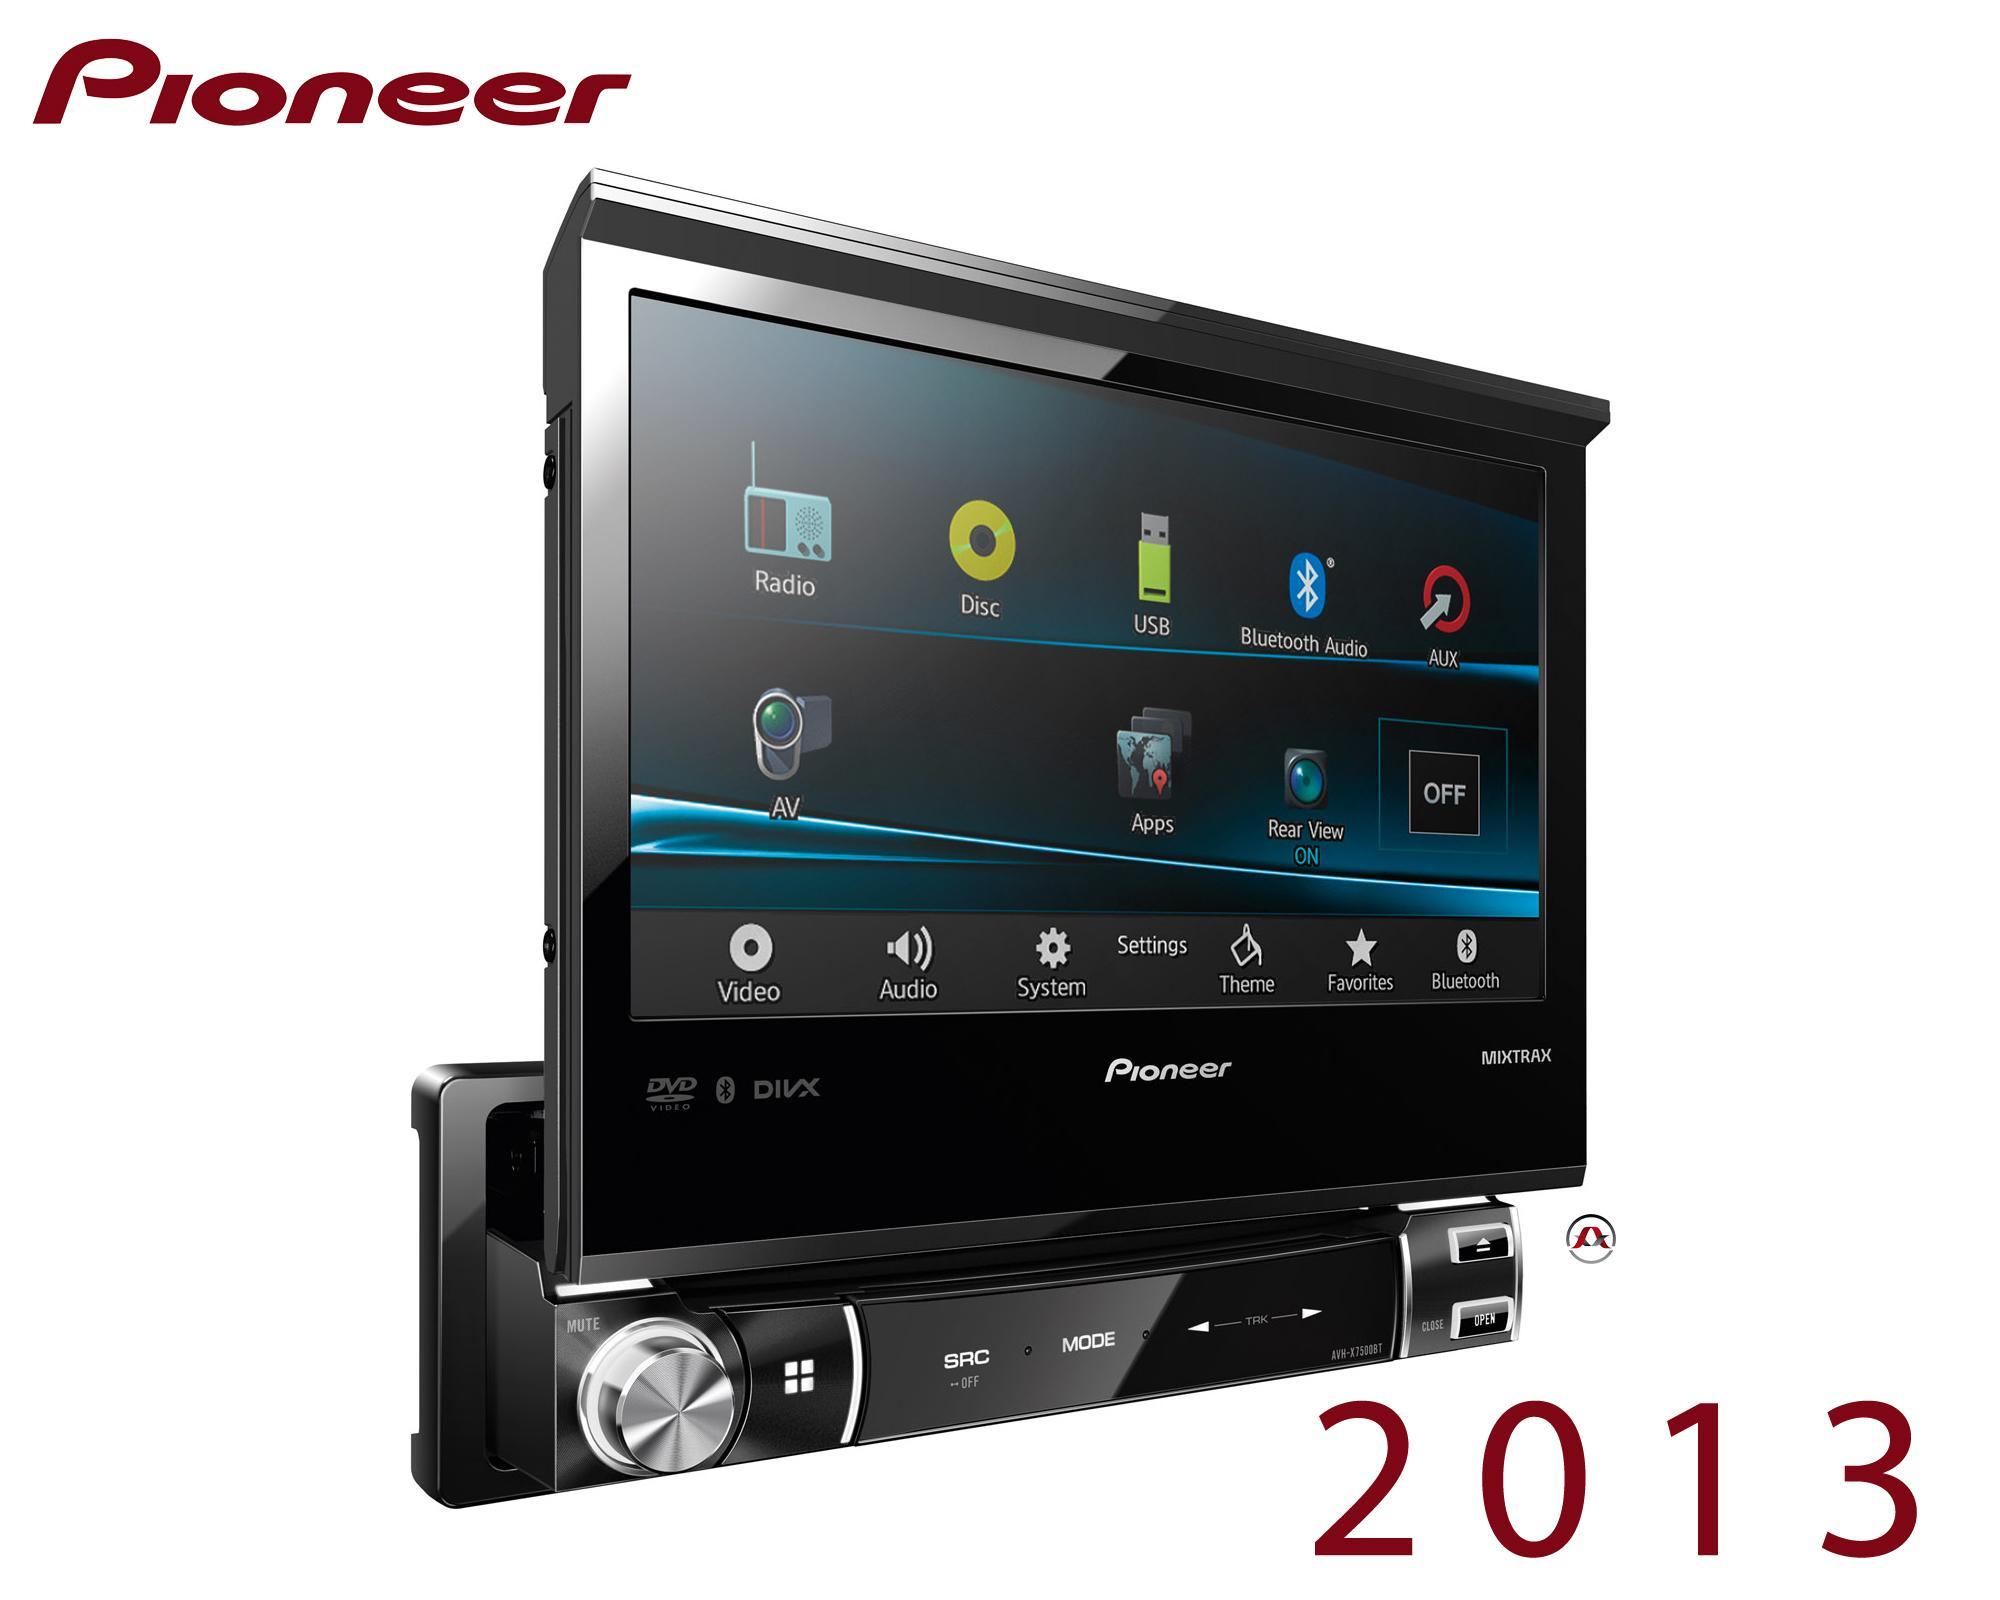 autoradio dvd pioneer avh x7500bt motorise 204287. Black Bedroom Furniture Sets. Home Design Ideas